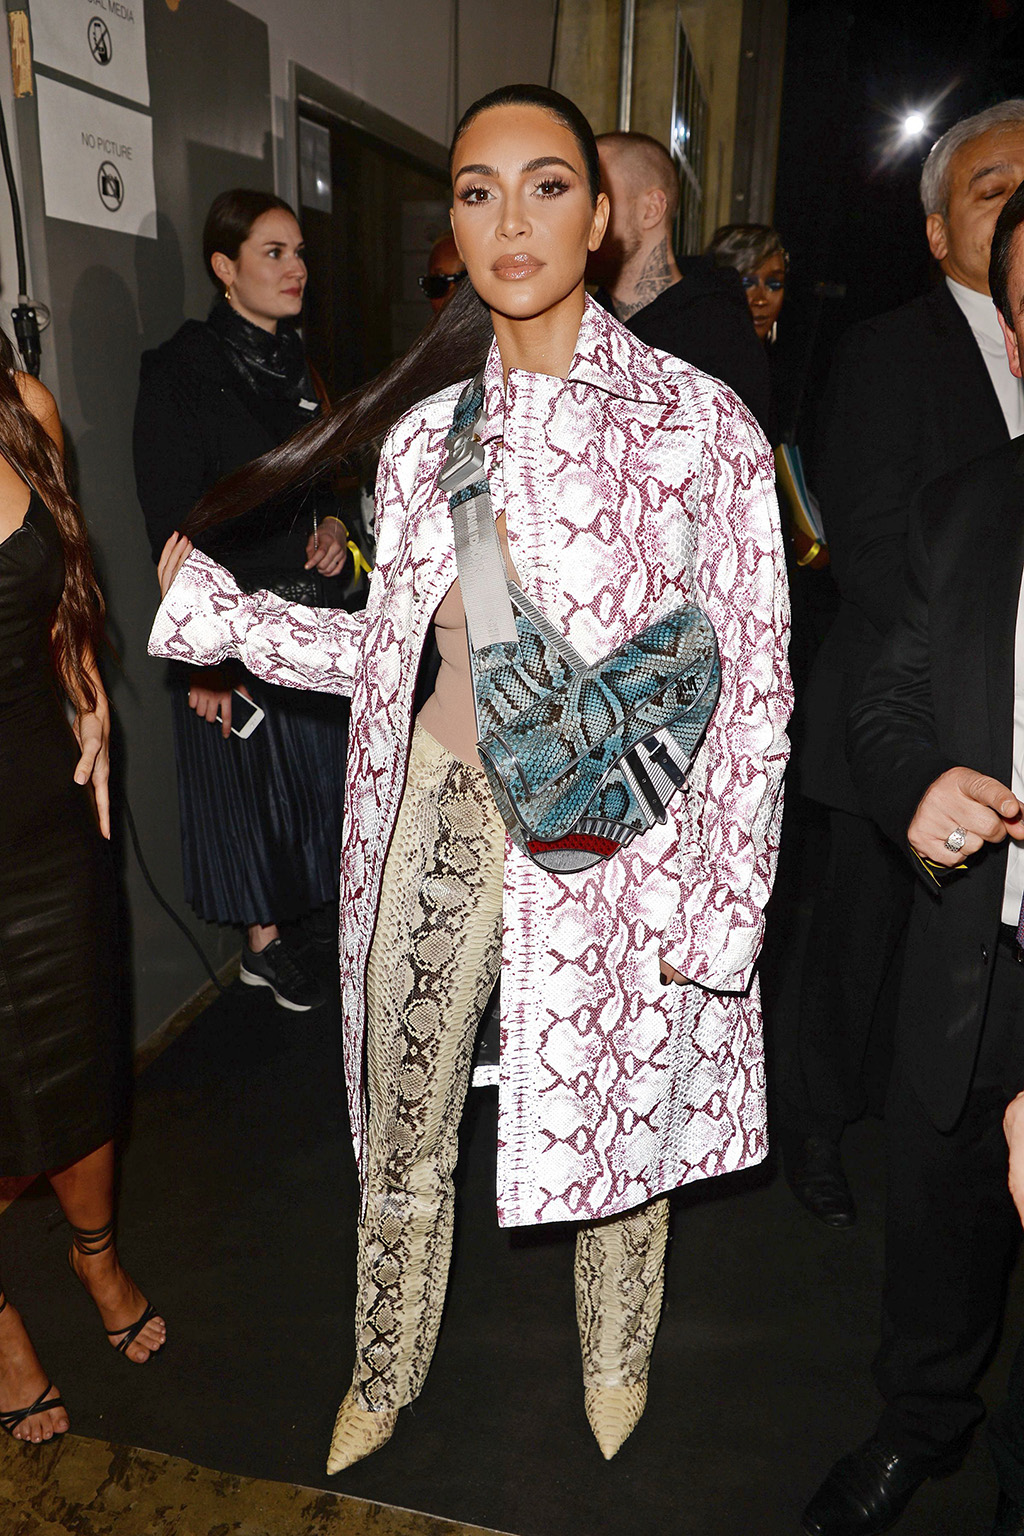 kim-kardashian-in-snakeskin-outfit-front-row-dior-mens-fall-2020-runway-show